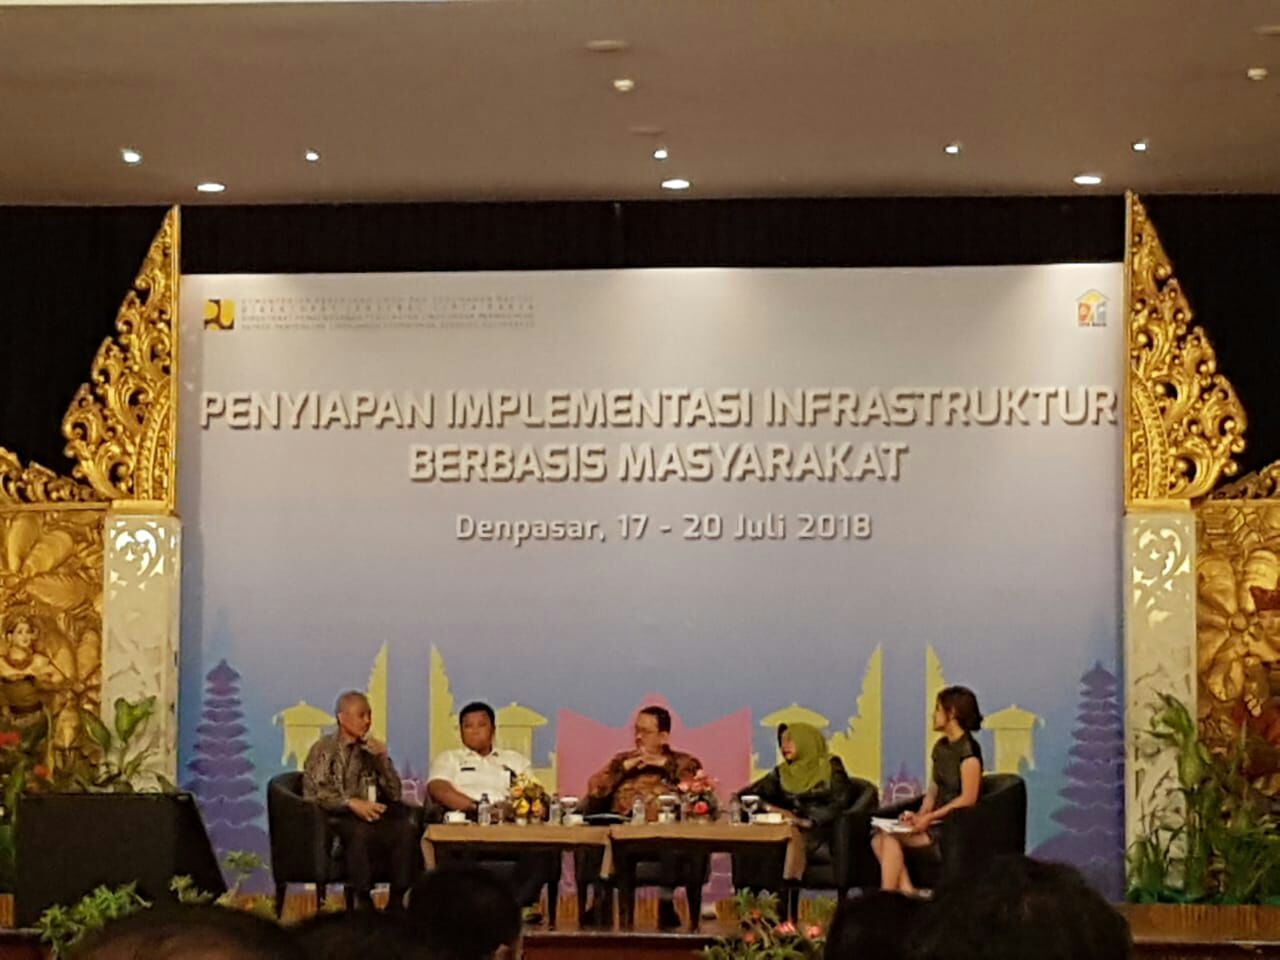 Tanjungpinang Tandatangani Perjanjian Kerjasama Sanimas